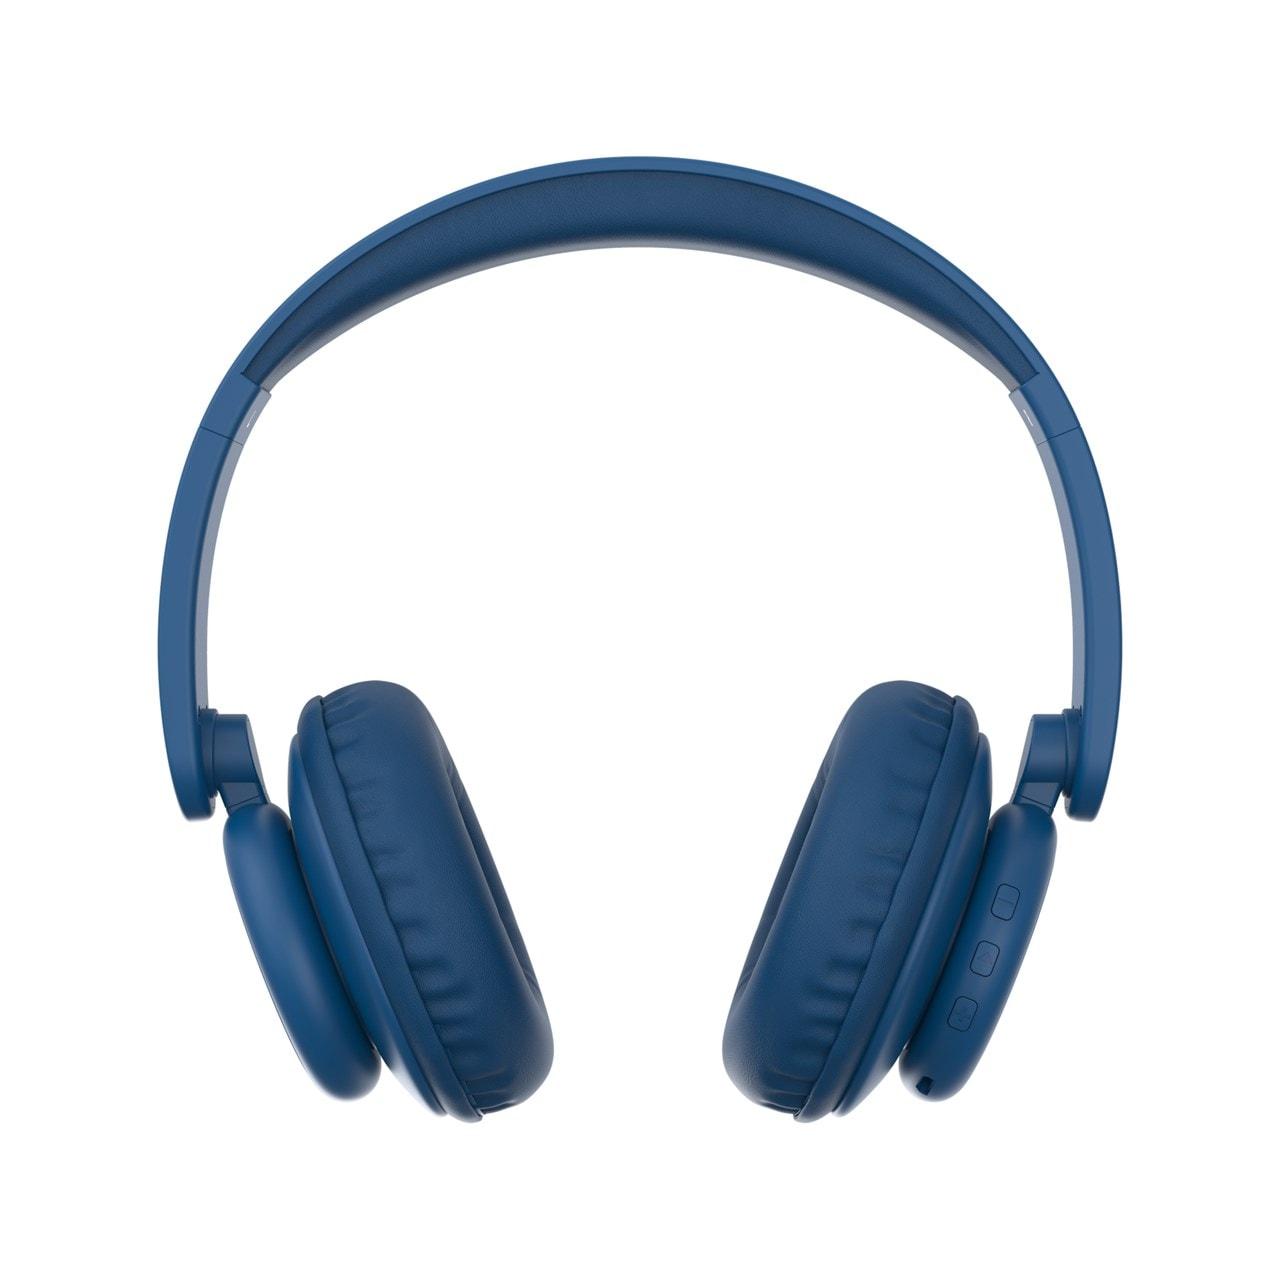 WeSC Navy Blue Bluetooth Headphones - 3